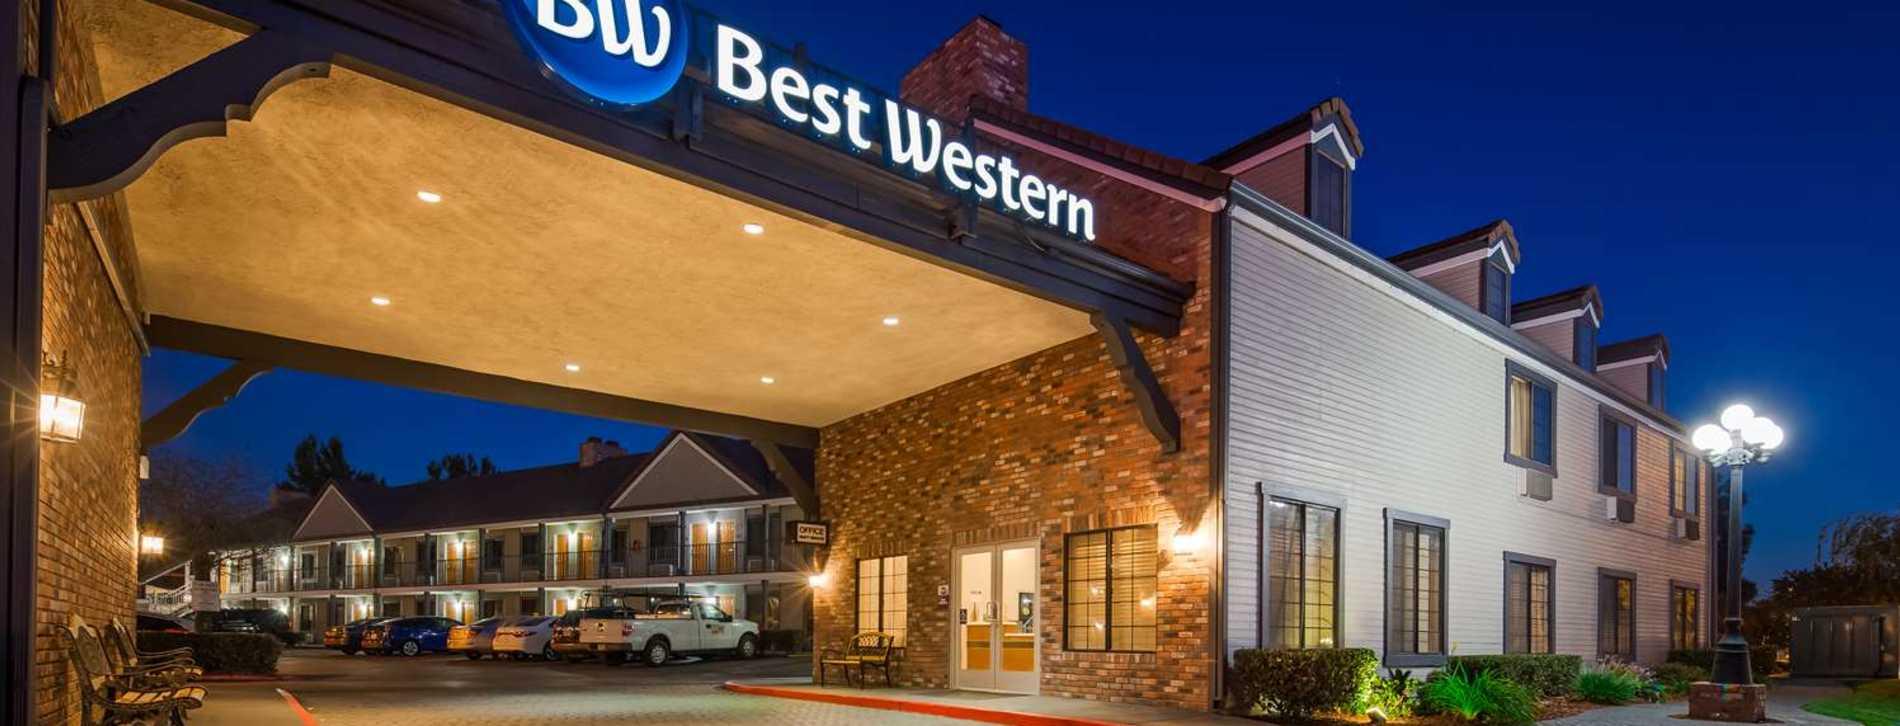 Best Western Country Inn Temecula, CA